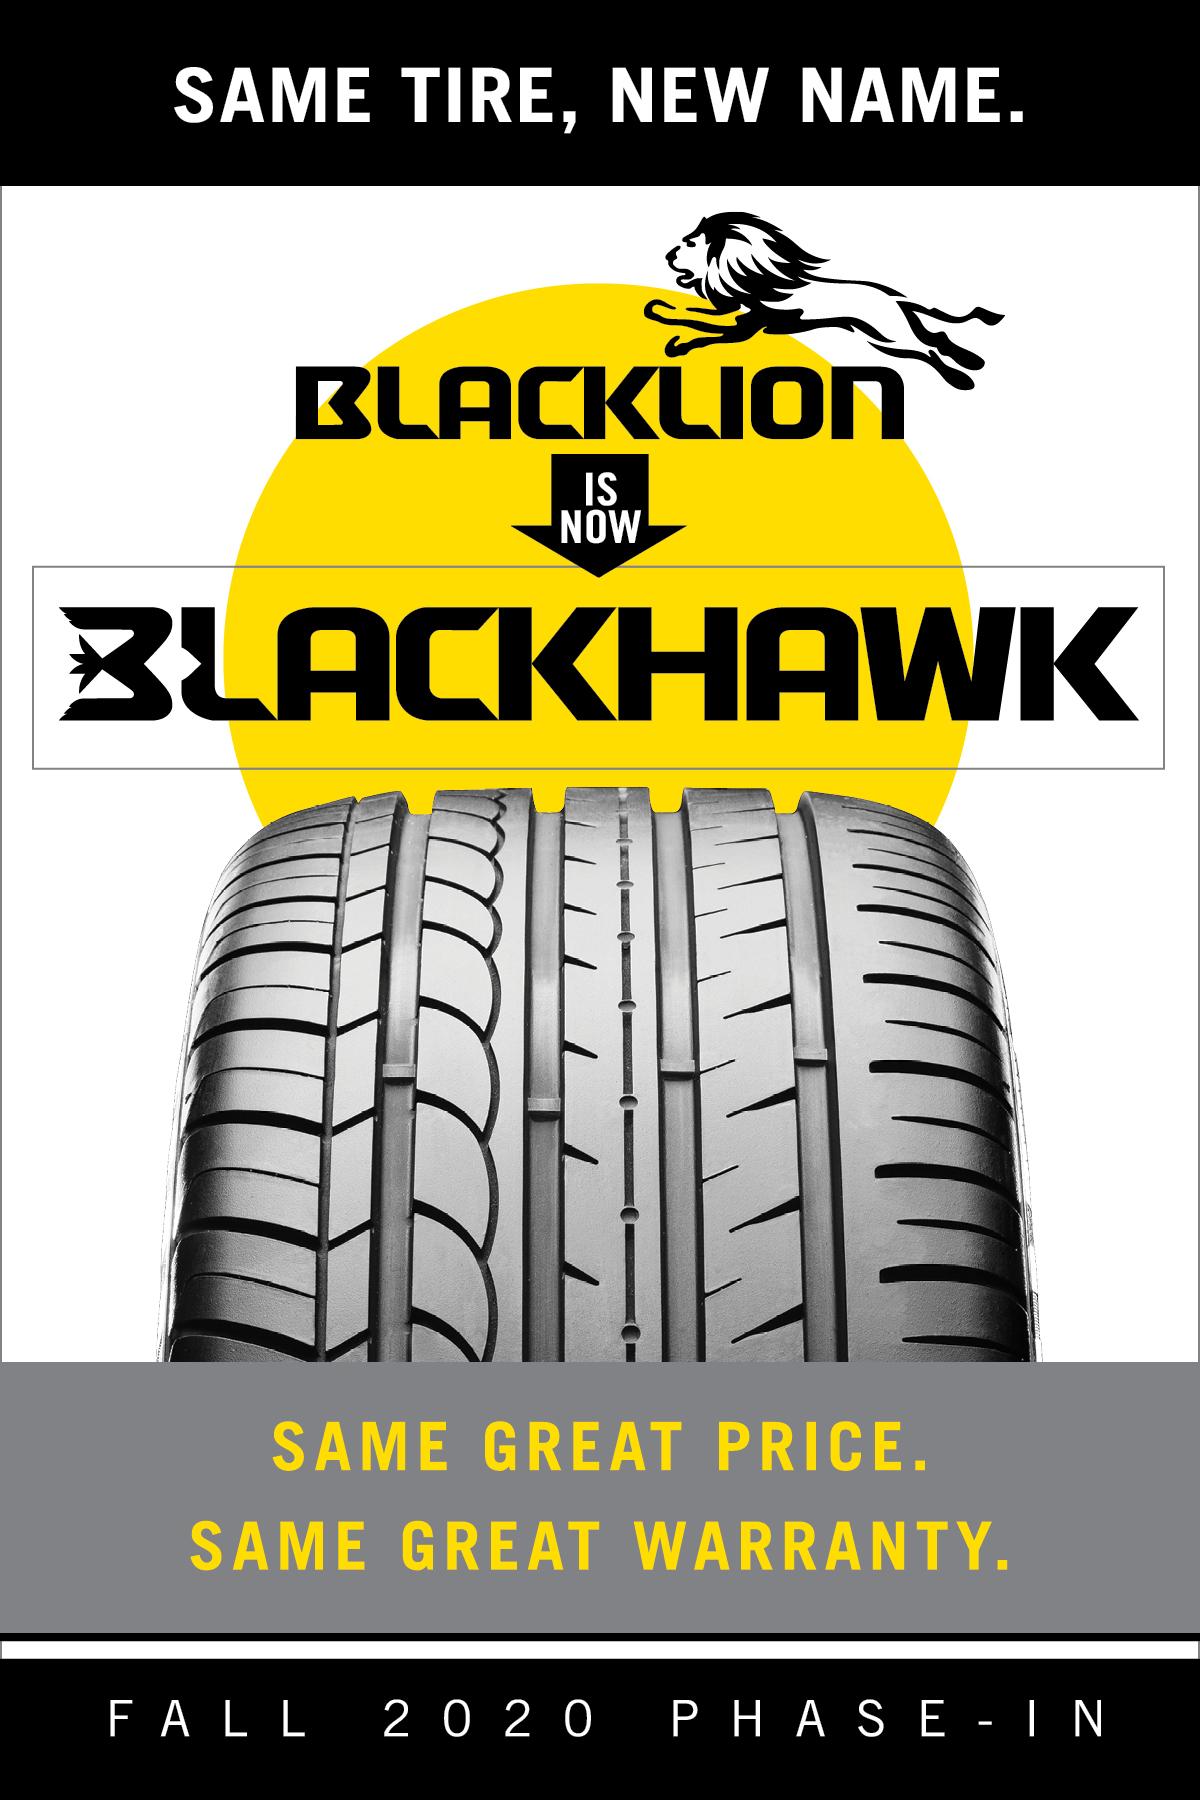 Blacklion is now Blackhawk